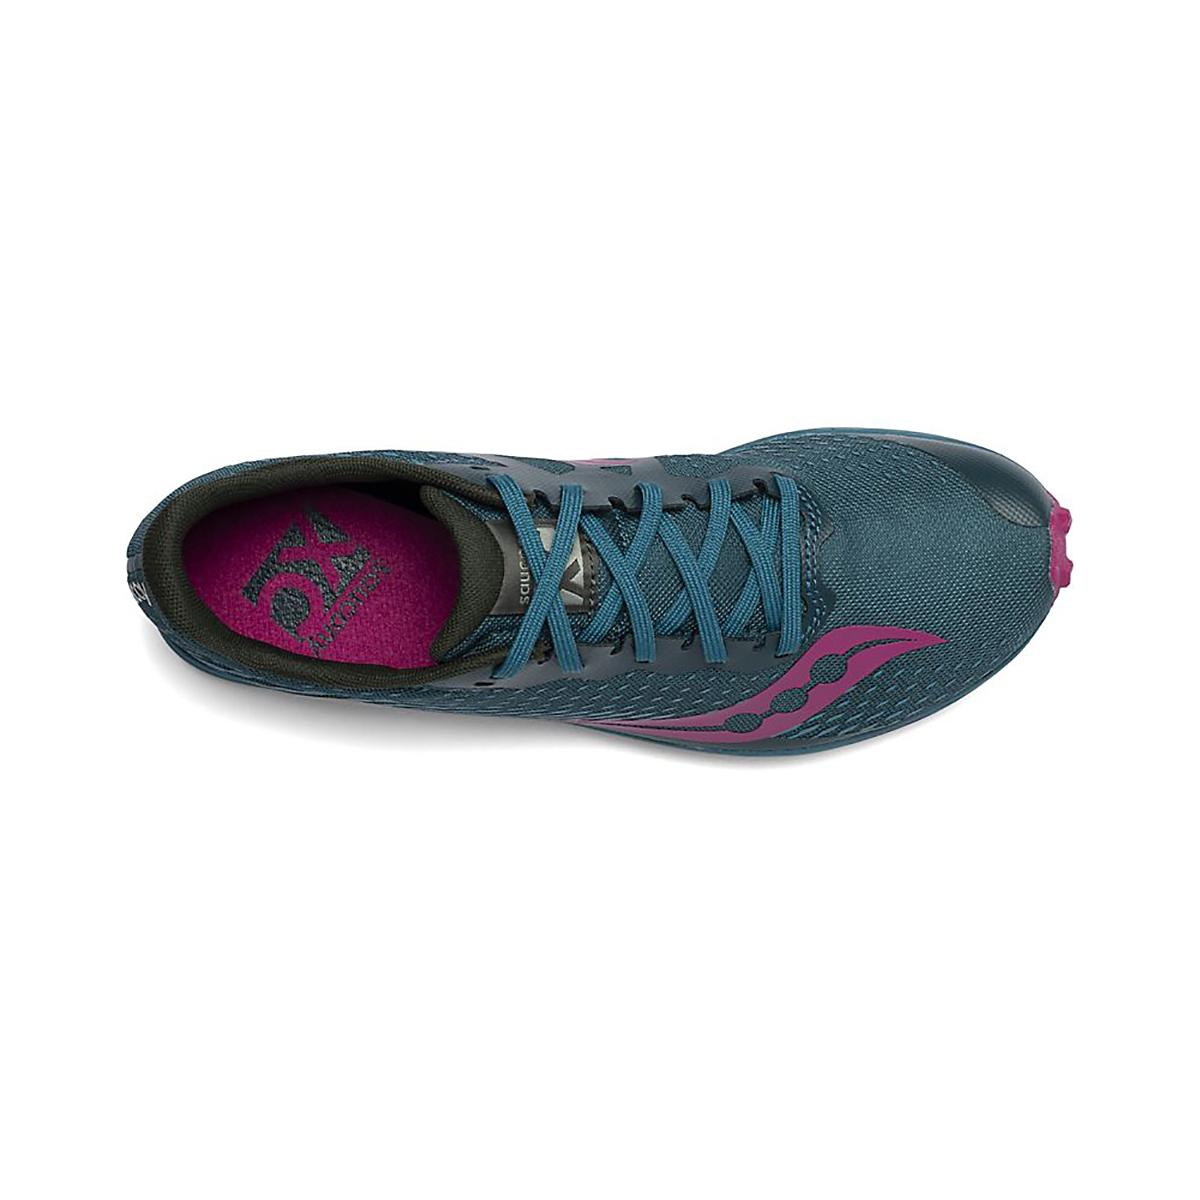 Women's Saucony Kilkenny XC8 Spike Shoes - Color: Marine - Size: 5 - Width: Regular, Marine, large, image 3